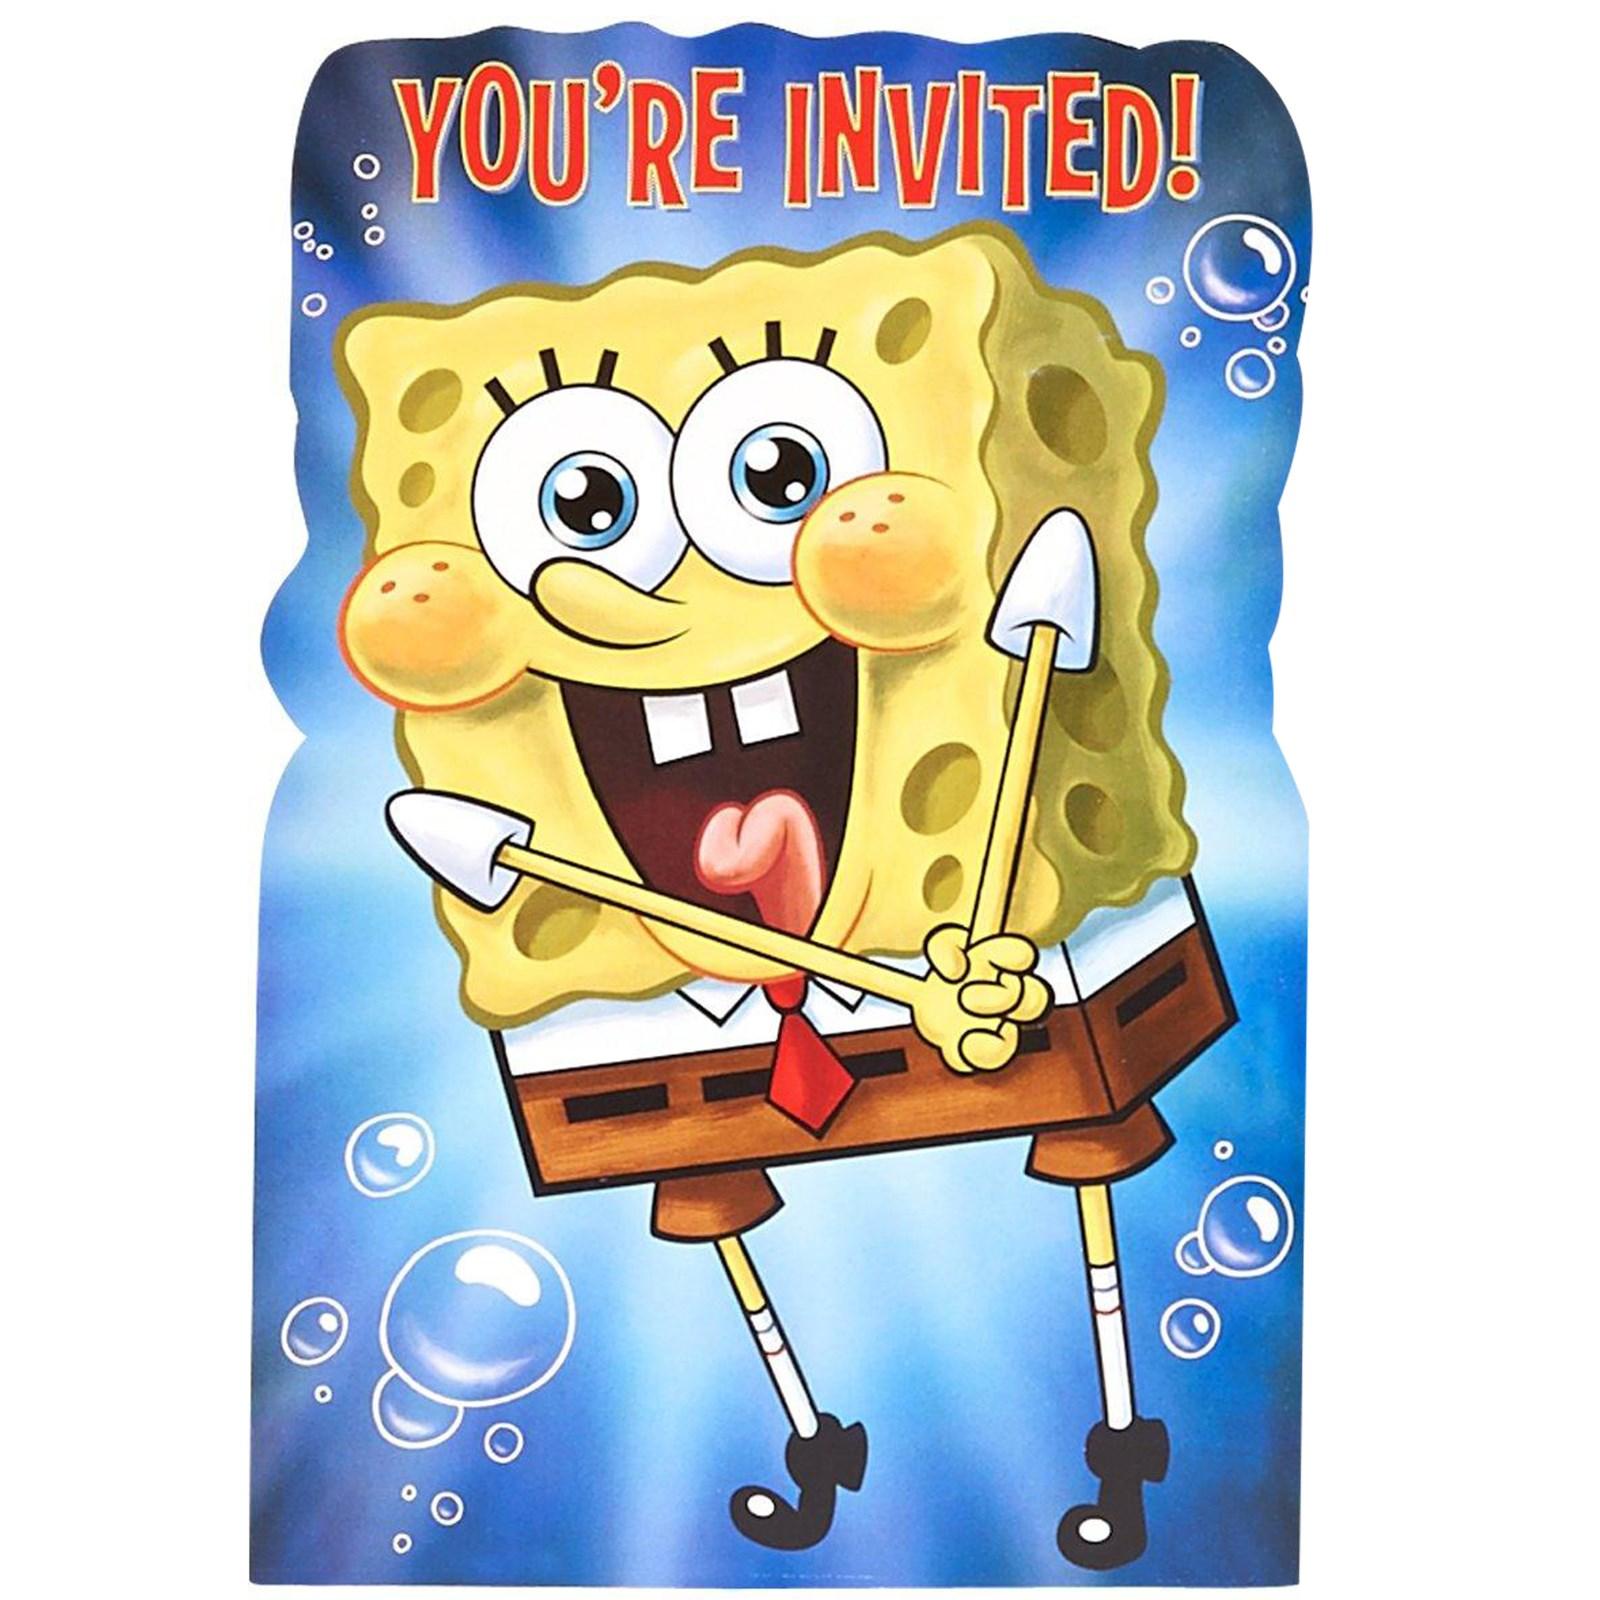 SpongeBob SquarePants Party Supplies – Spongebob Birthday Party Invitations